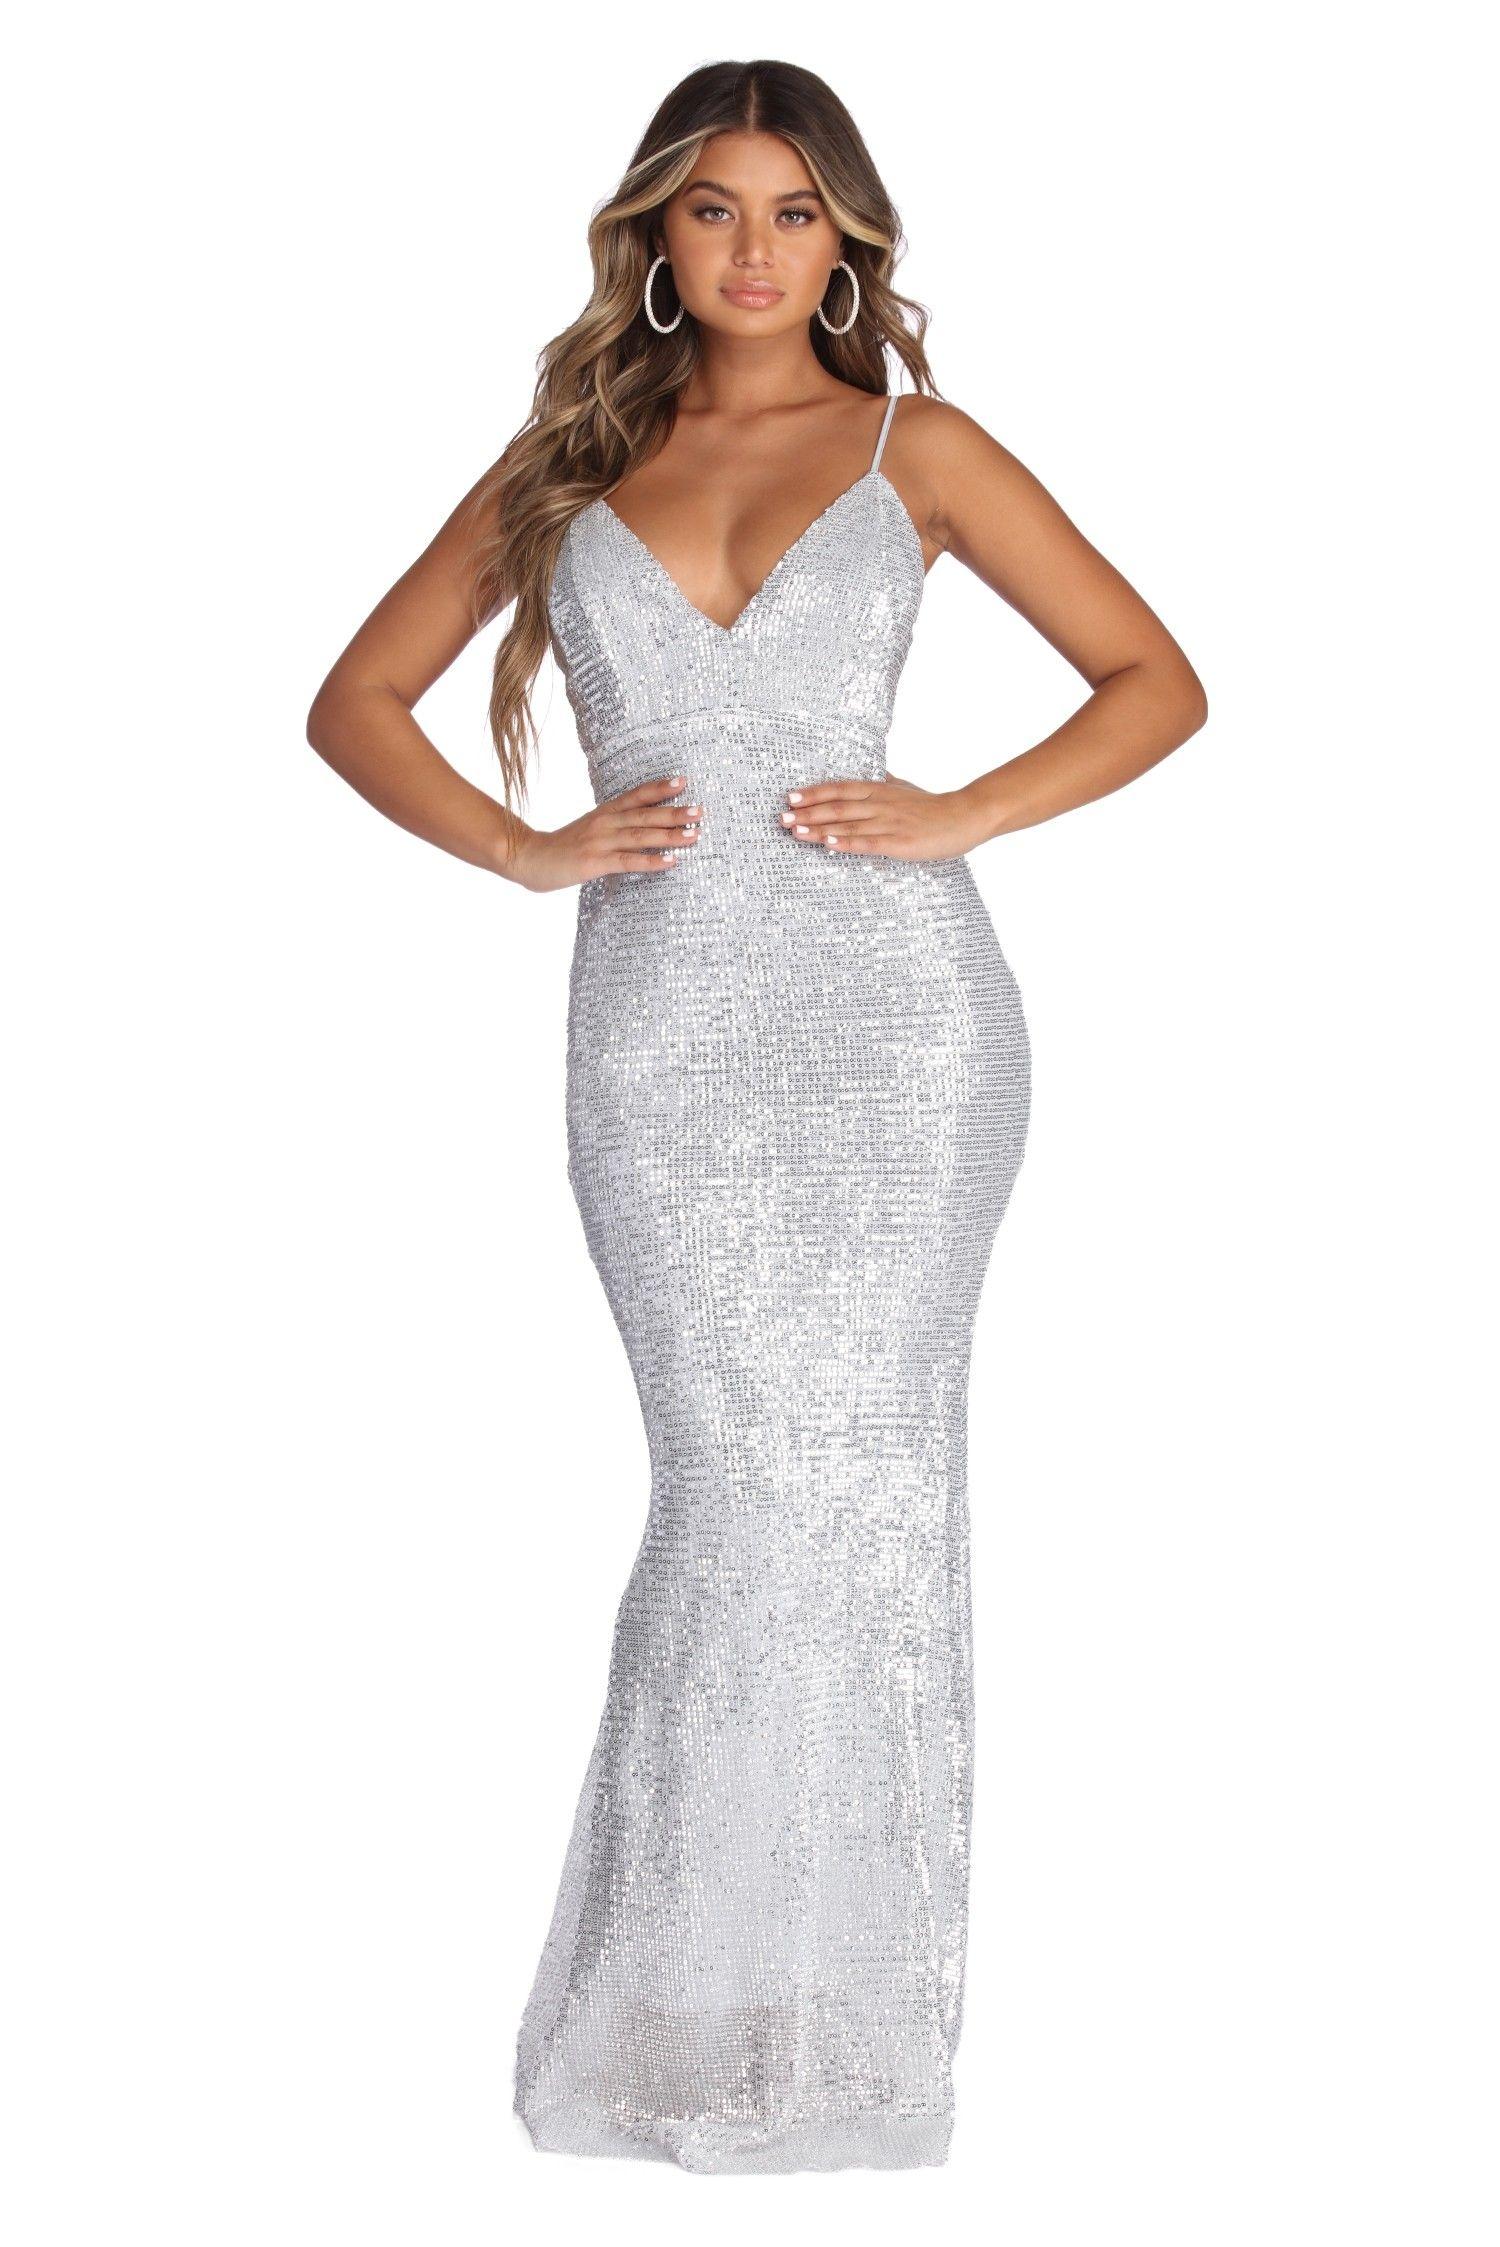 094c0f95 Gabriela Formal Sequin Glam Dress in 2019   prom   Glam dresses ...